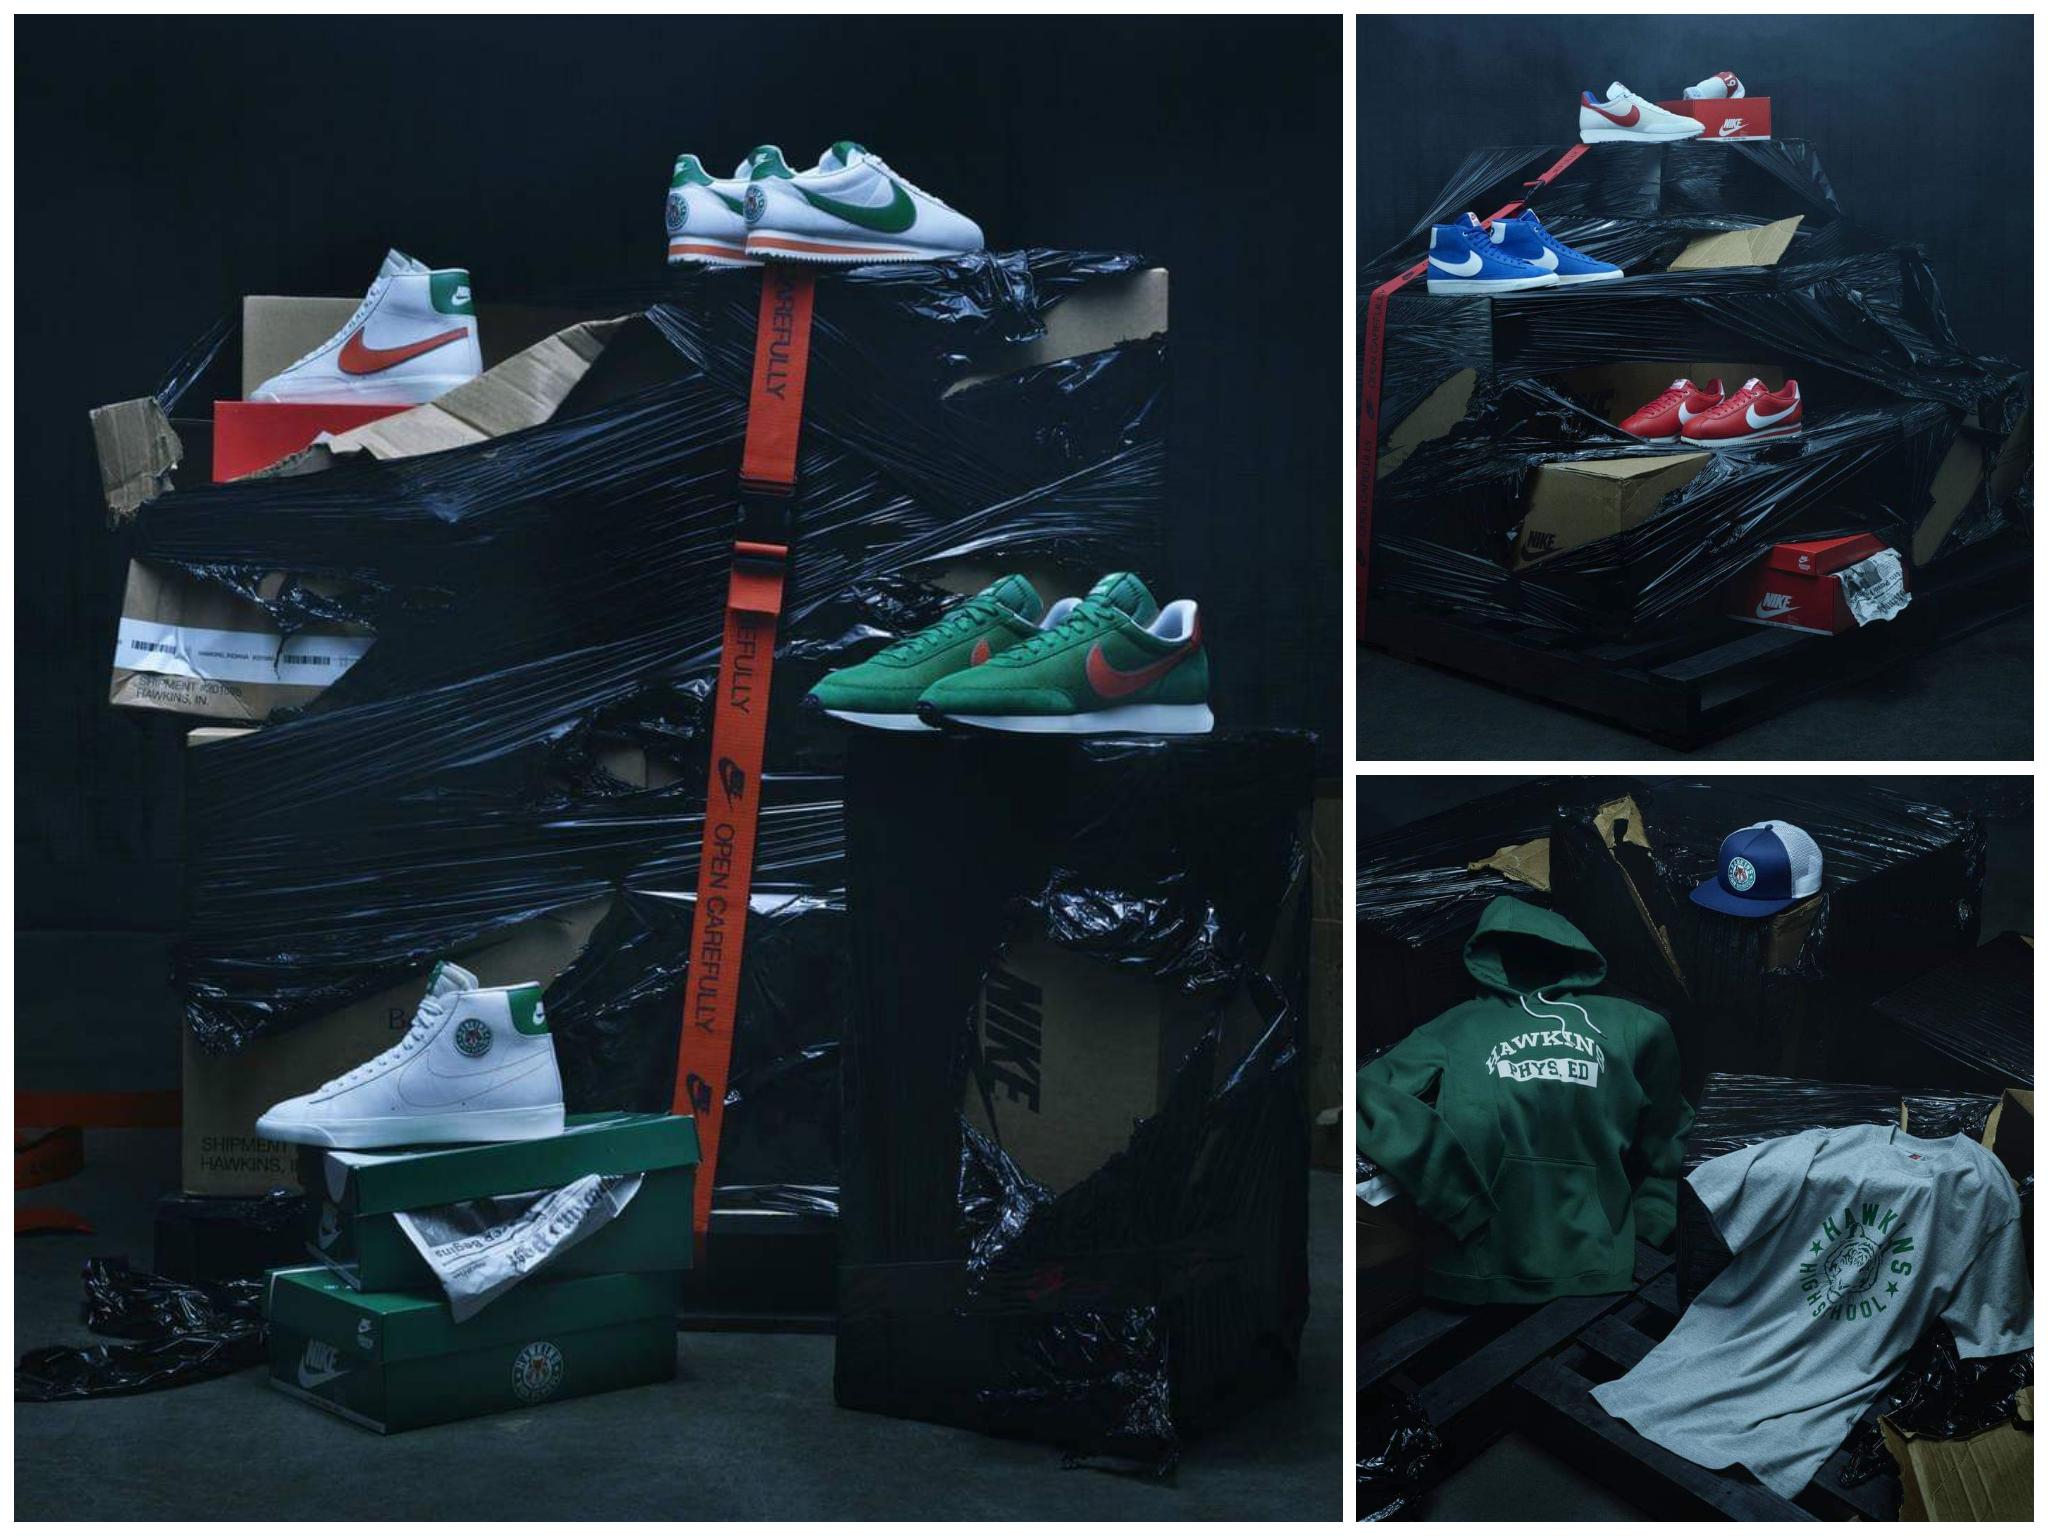 Ropa Línea Y A La De Stranger Things Querer Toda Vas Nike nPy8Ov0mNw